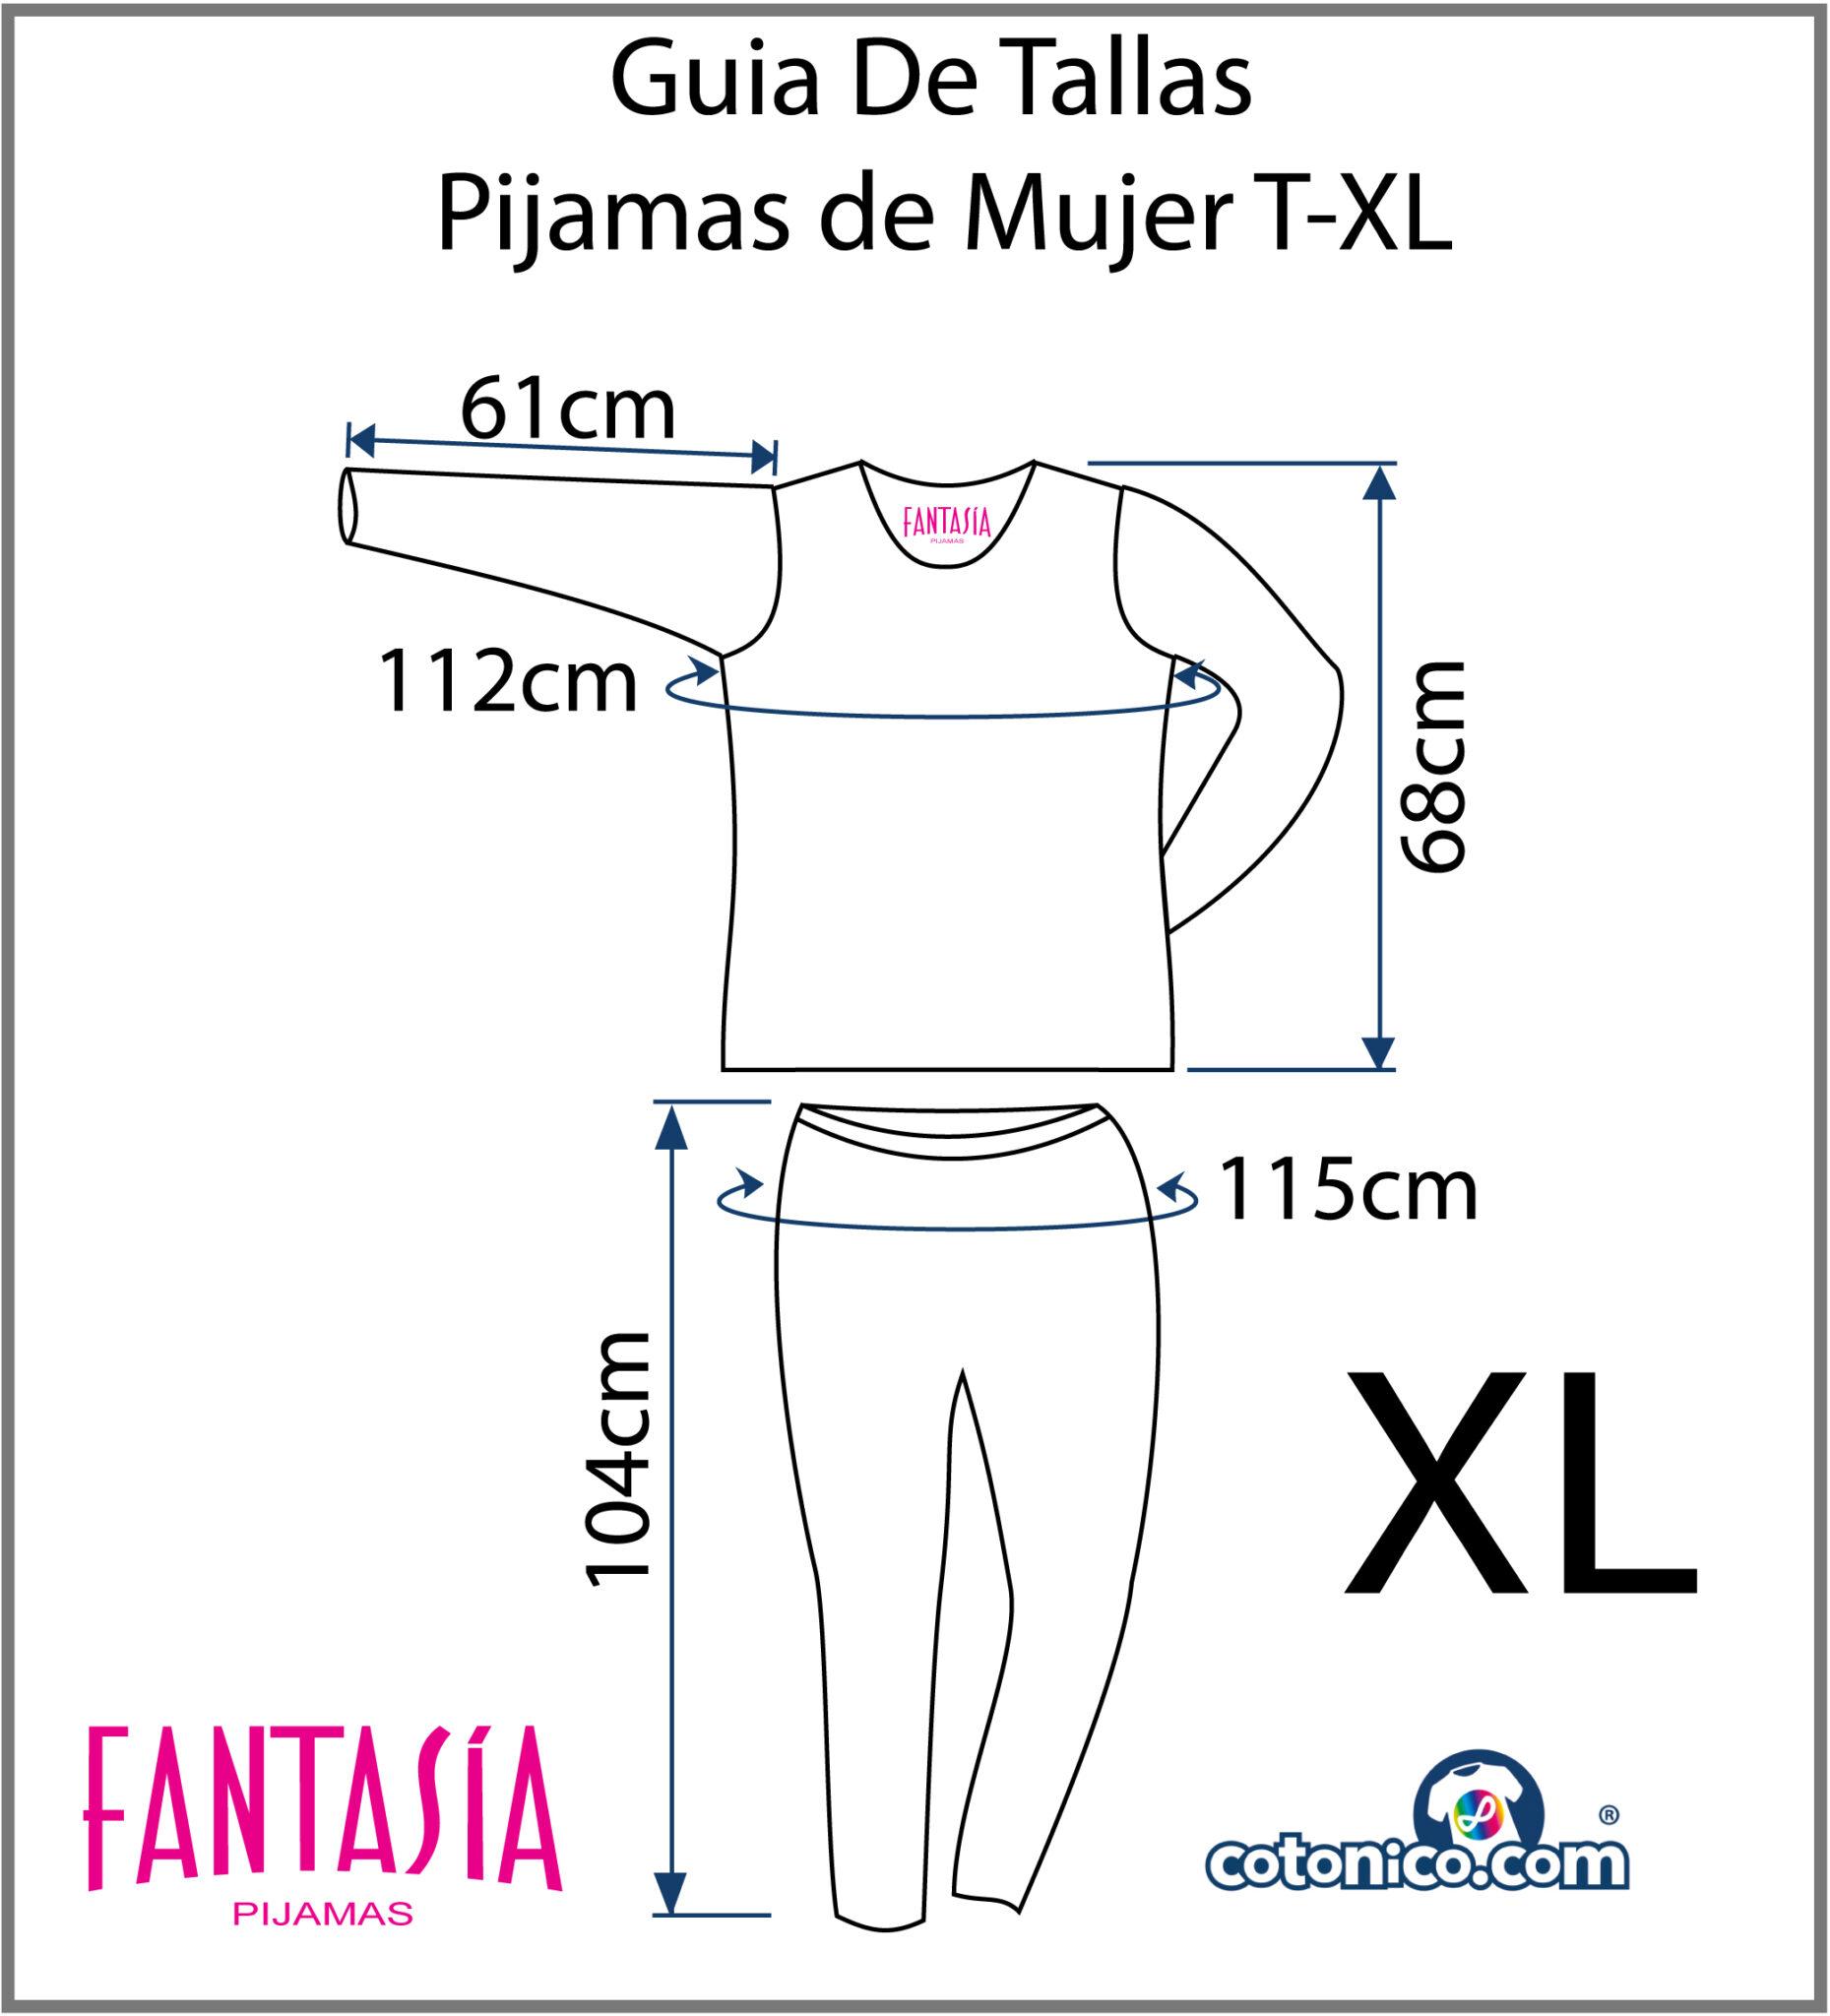 Guia-De-Tallas-Pijamas-De-Mujer-XL